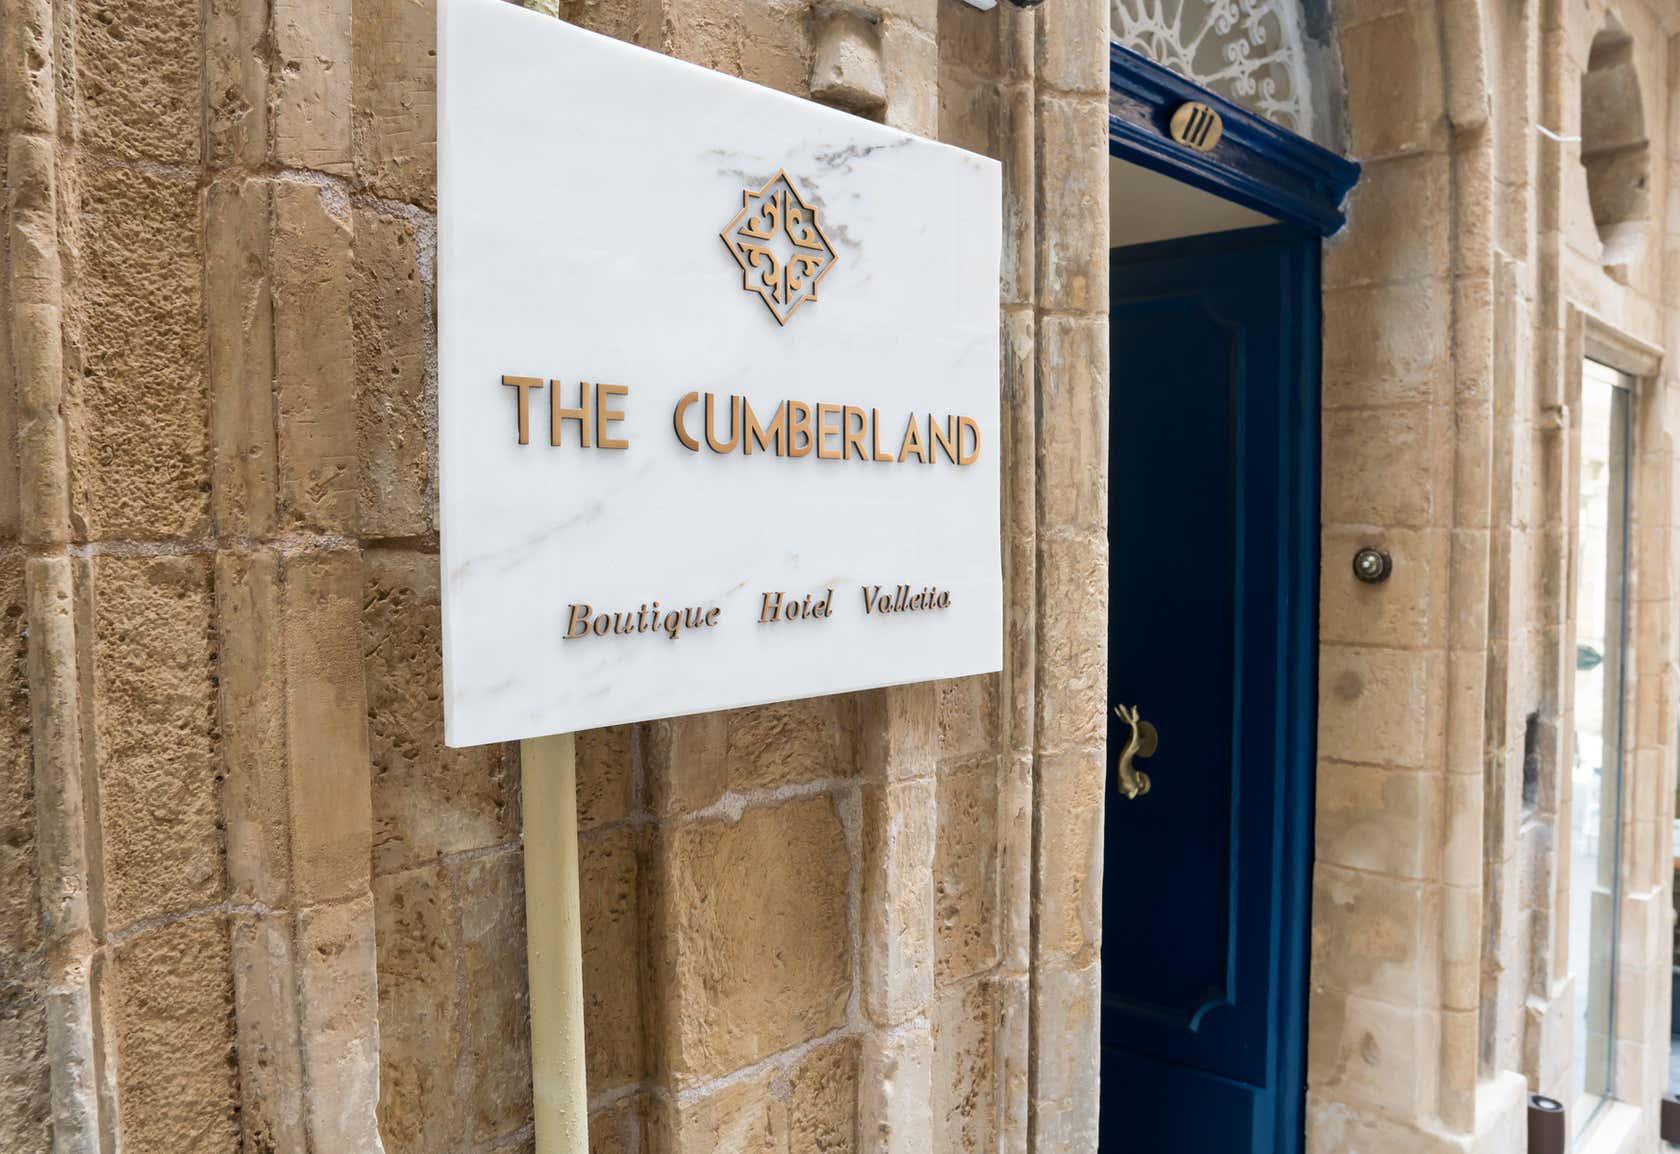 The Cumberland